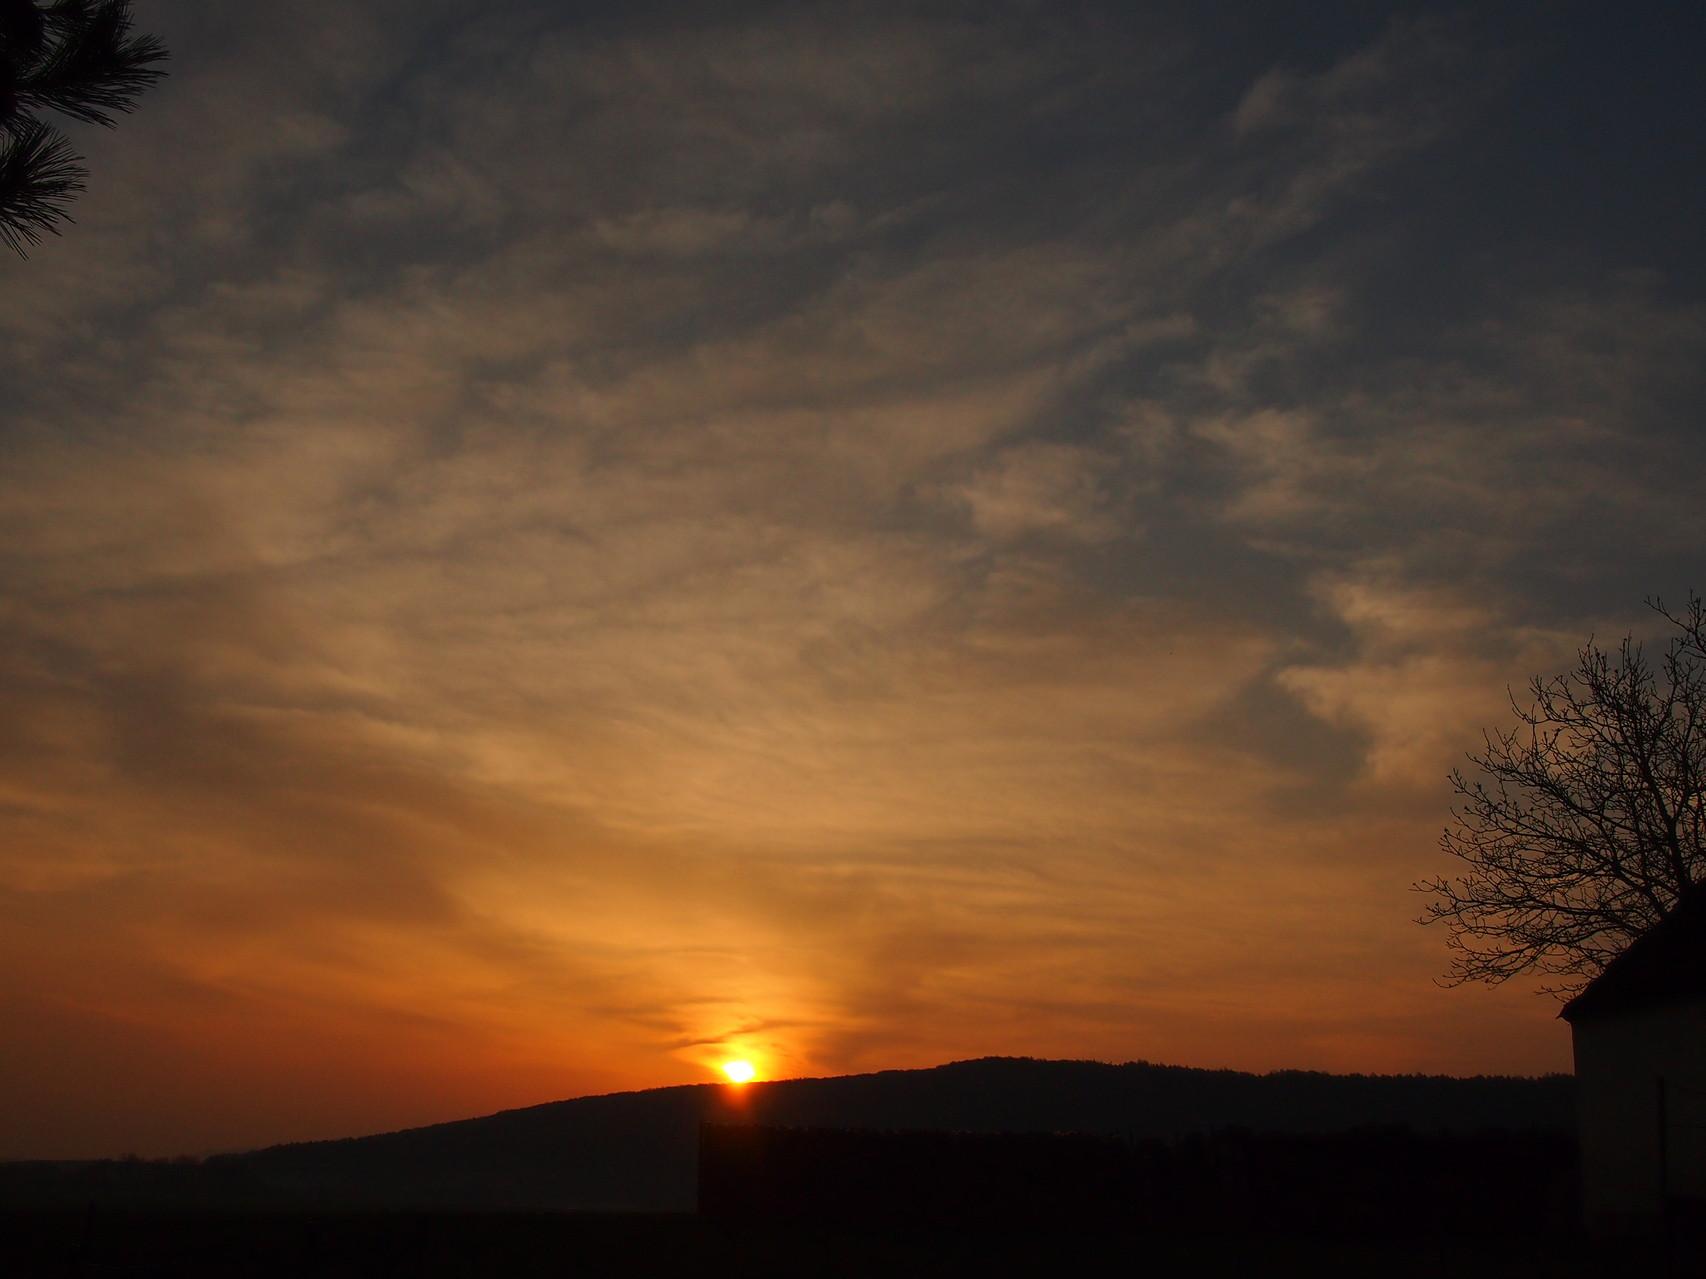 Sonneaufgang über unserem Hausberg